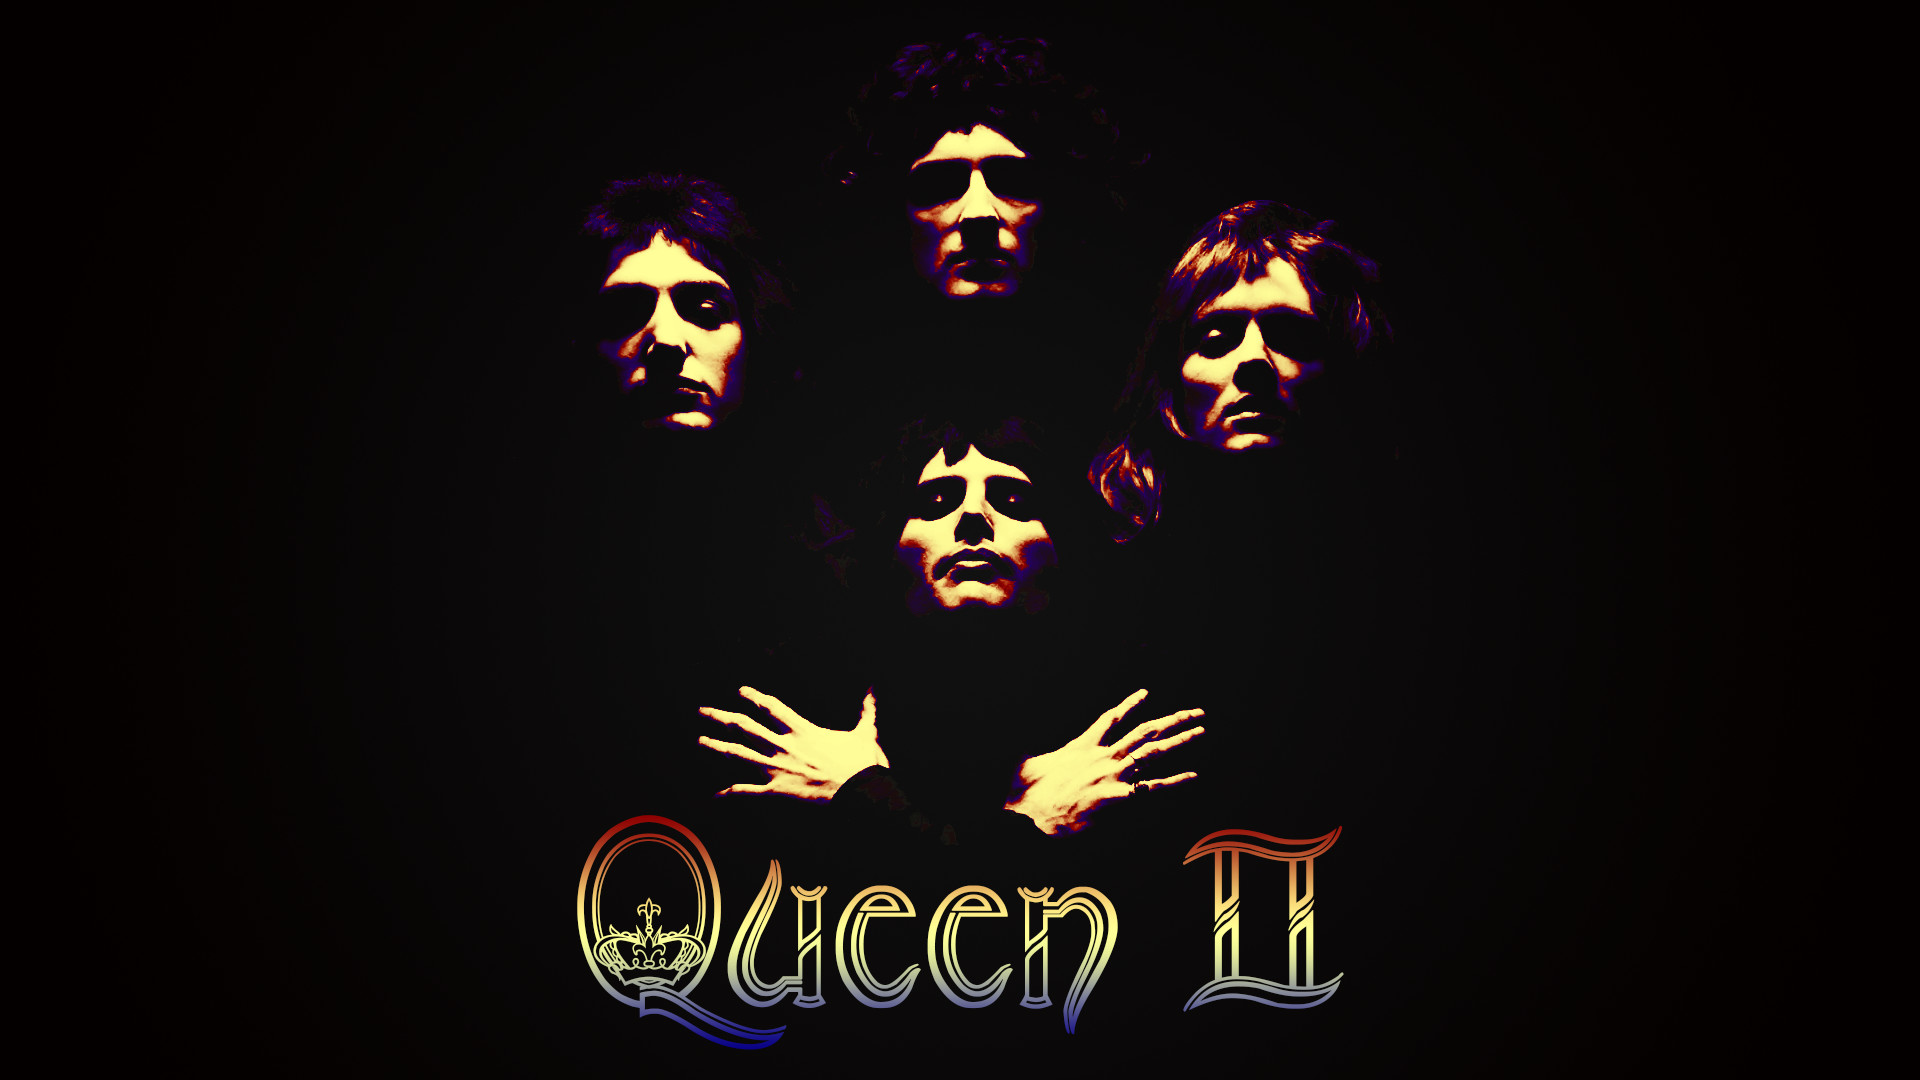 Queen Band Wallpaper Desktop ①